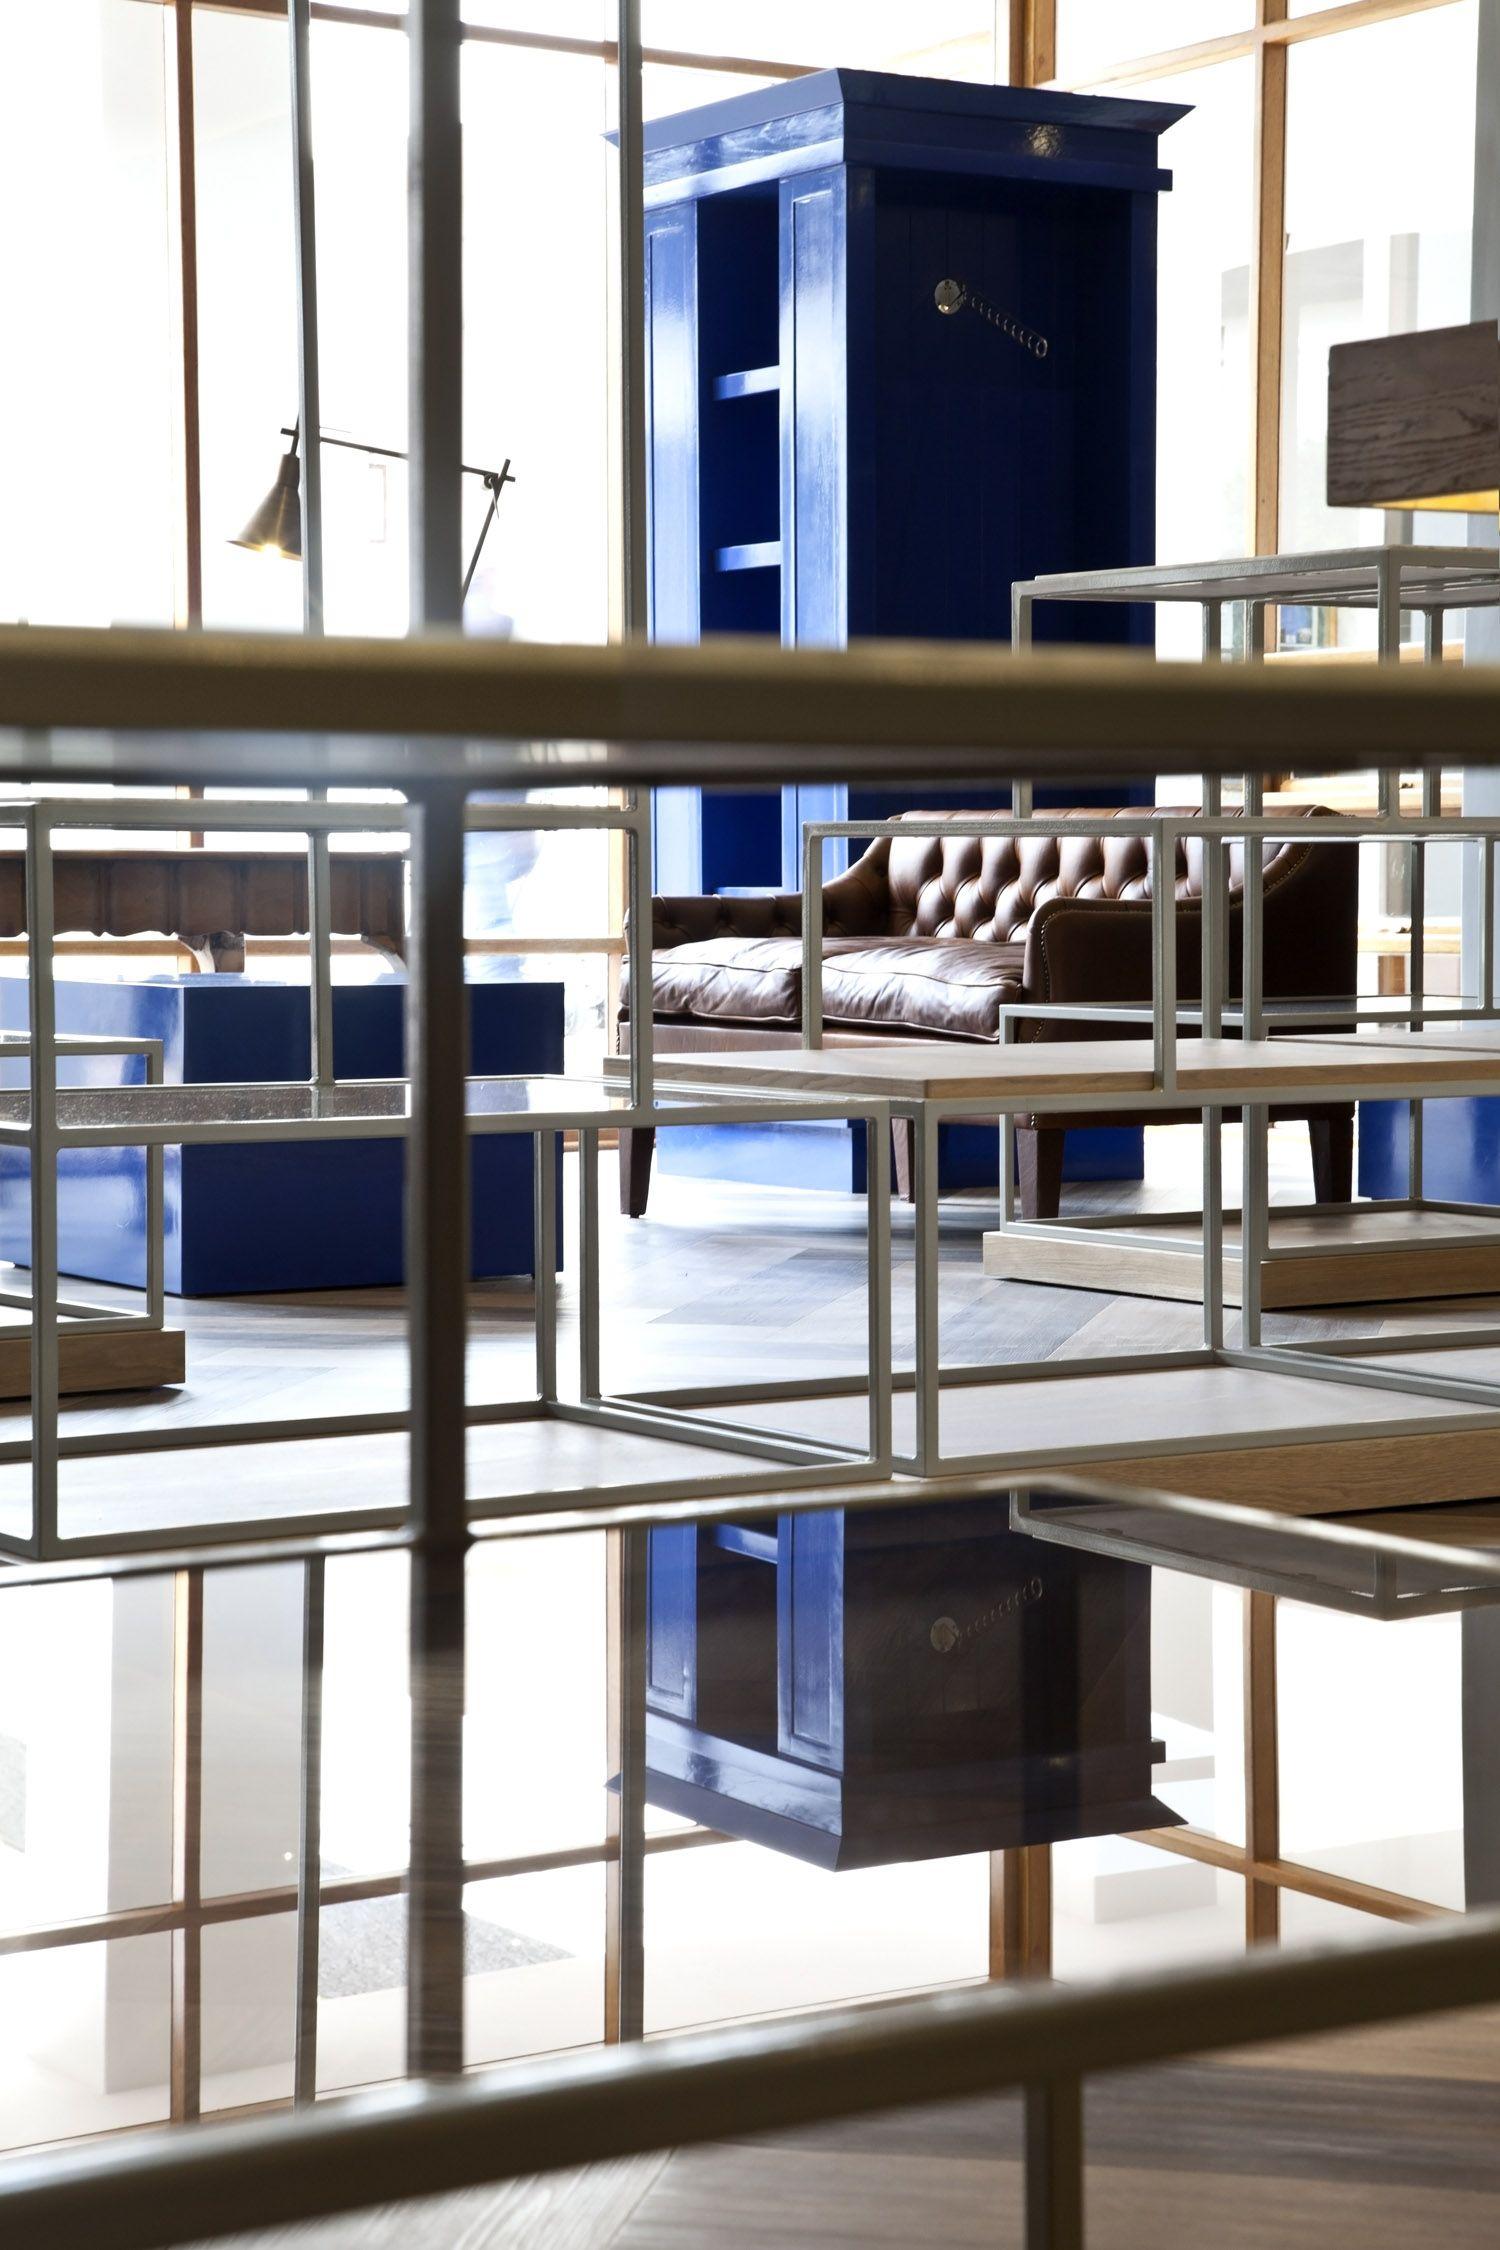 Etienne de souza designer and manufacturer of luxury cabinet - Pro Shop Golf Retail Design Display High Gloss Blue Shop